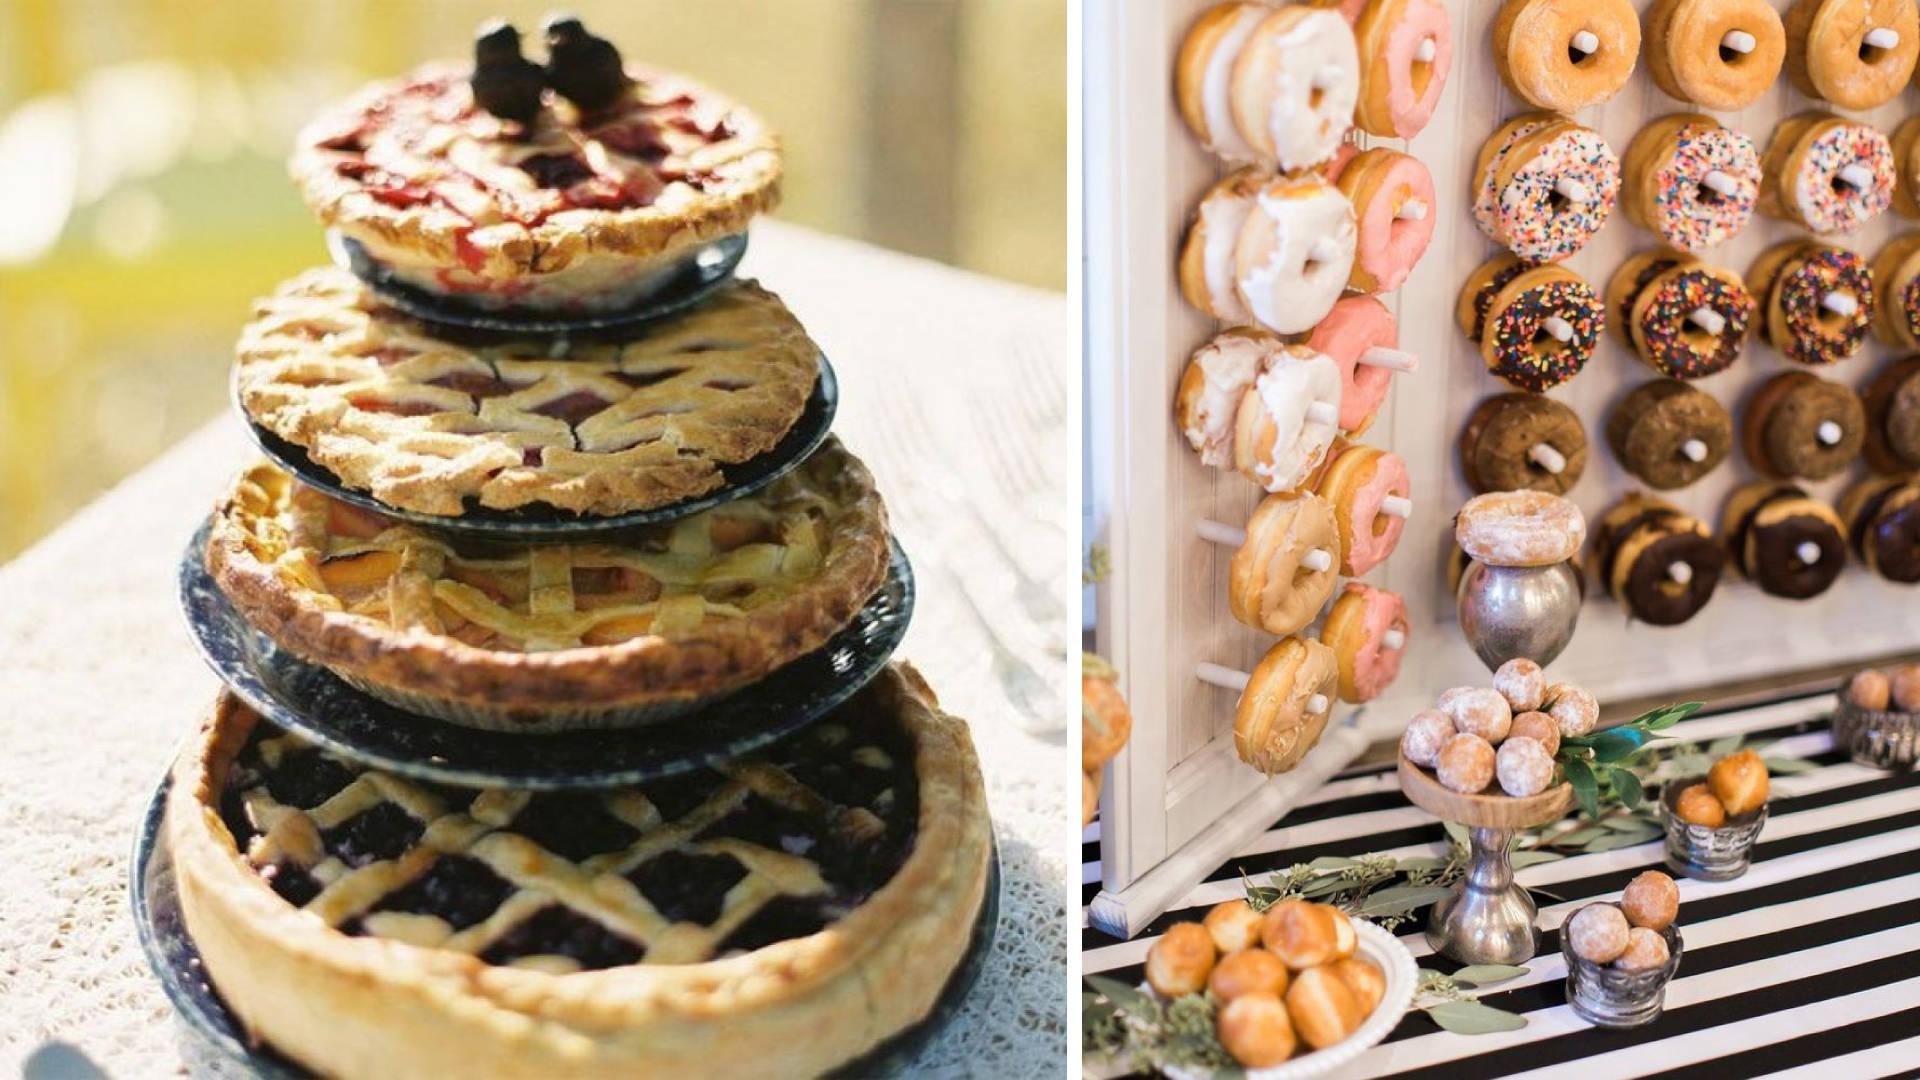 A Pie and Doughnut Station